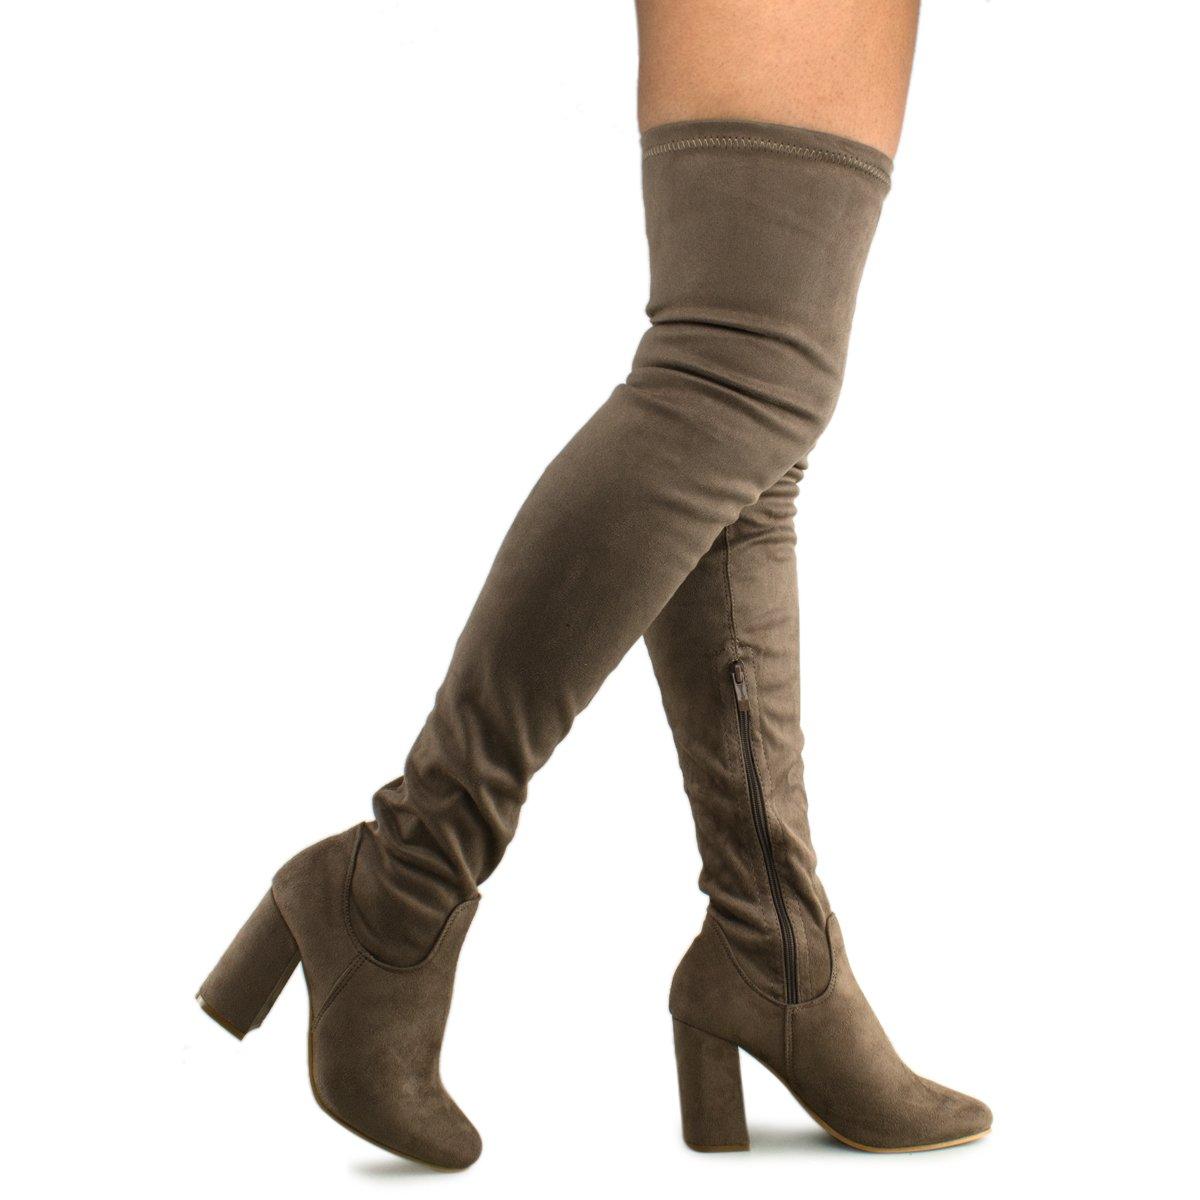 Premier Standard - Women Fashion Comfy Vegan Suede Block Heel Slip On Thigh High Over The Knee Boots, TPS Elantra-01 v2 Taupe Size 8.5